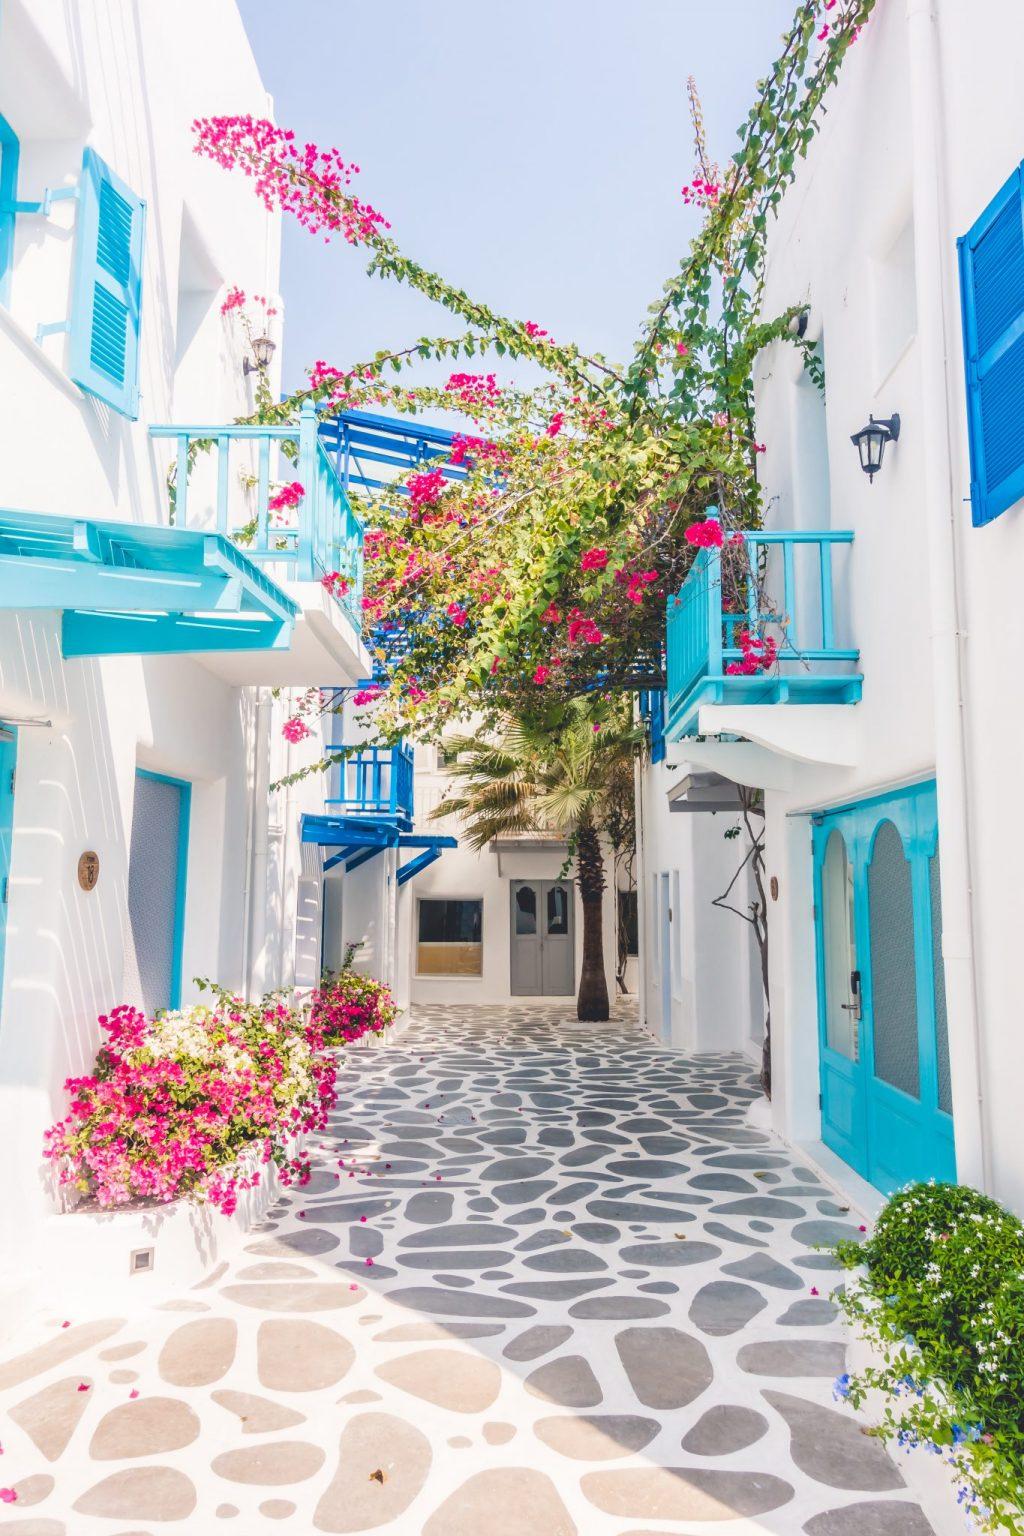 European bucket list destination, Greece. The island of Santorini.